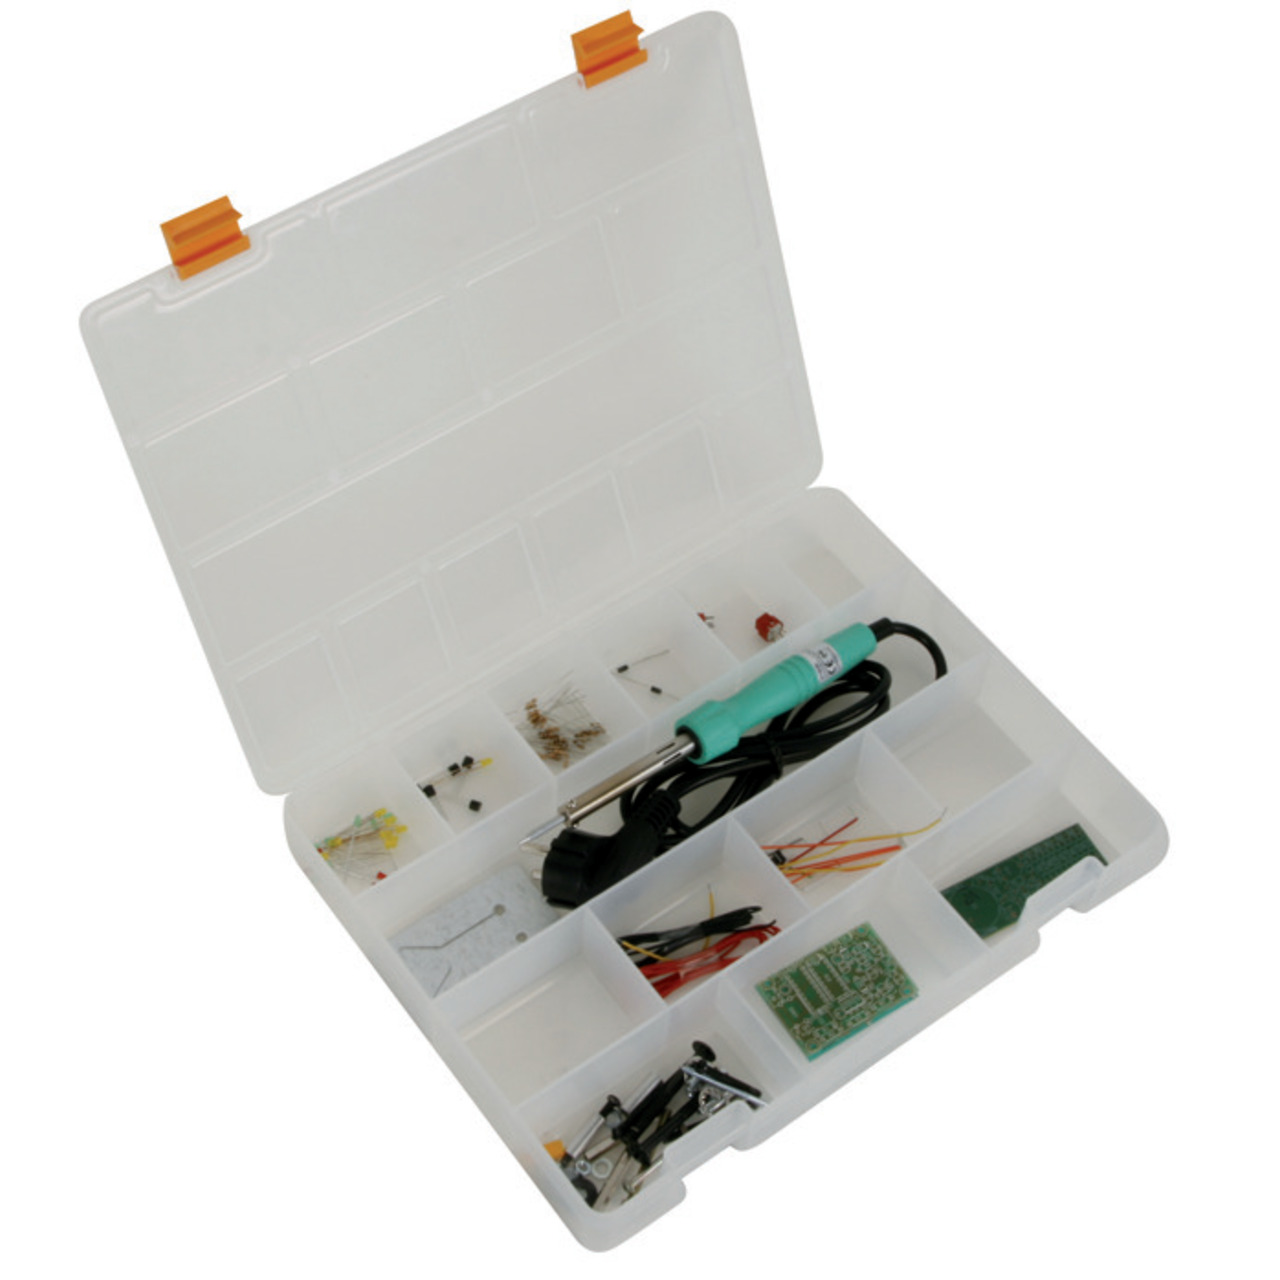 Velleman EDU03 Löt-Lernpaket- 30 W- 230 V- inkl- 2 Bausätzen